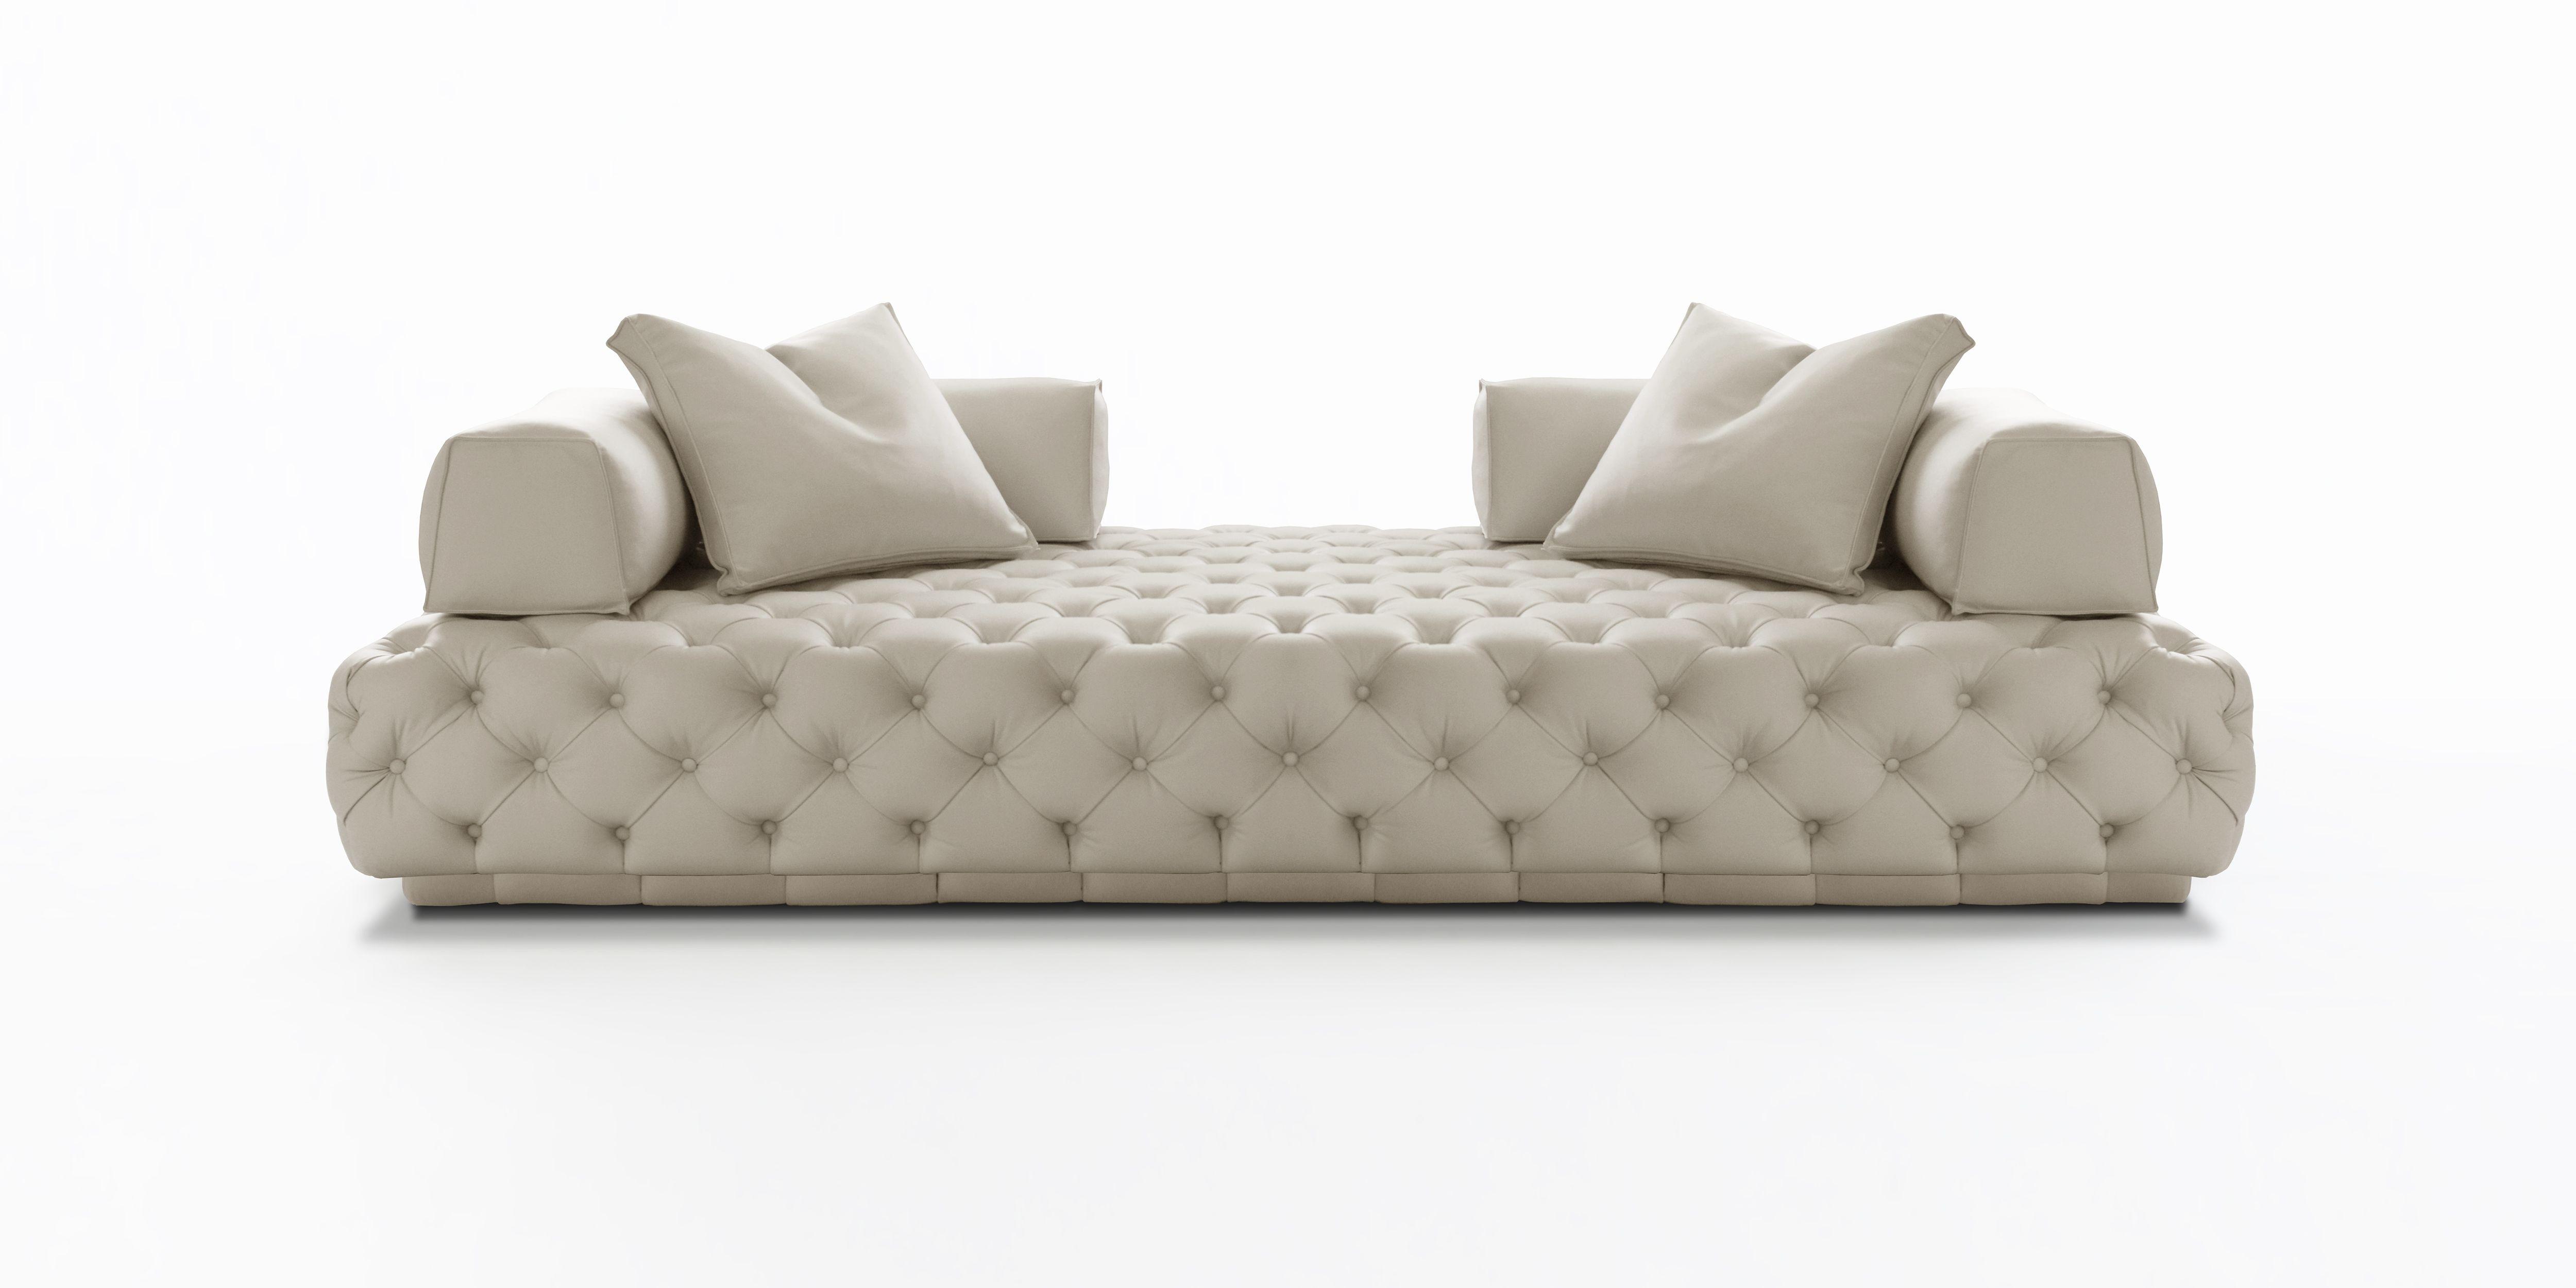 Brilliant Cielo Sofa Sofas In 2019 Furniture Sofa Elegant Sofa Interior Design Ideas Tzicisoteloinfo